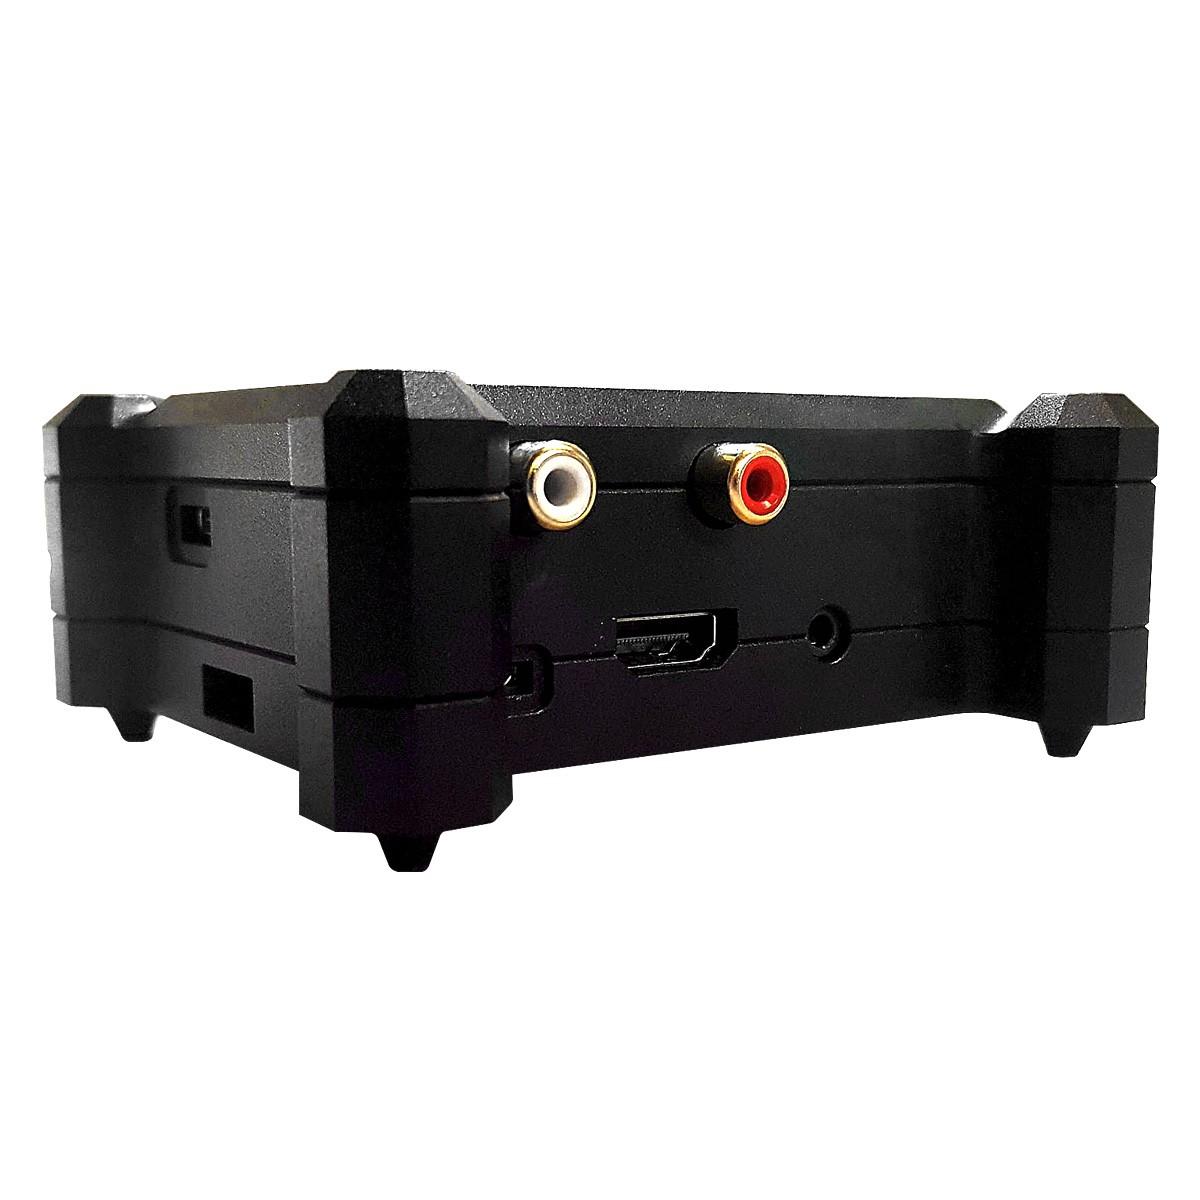 ALLO Boîtier Aluminium pour Allo DAC Boss et Raspberry Pi 3 Noir